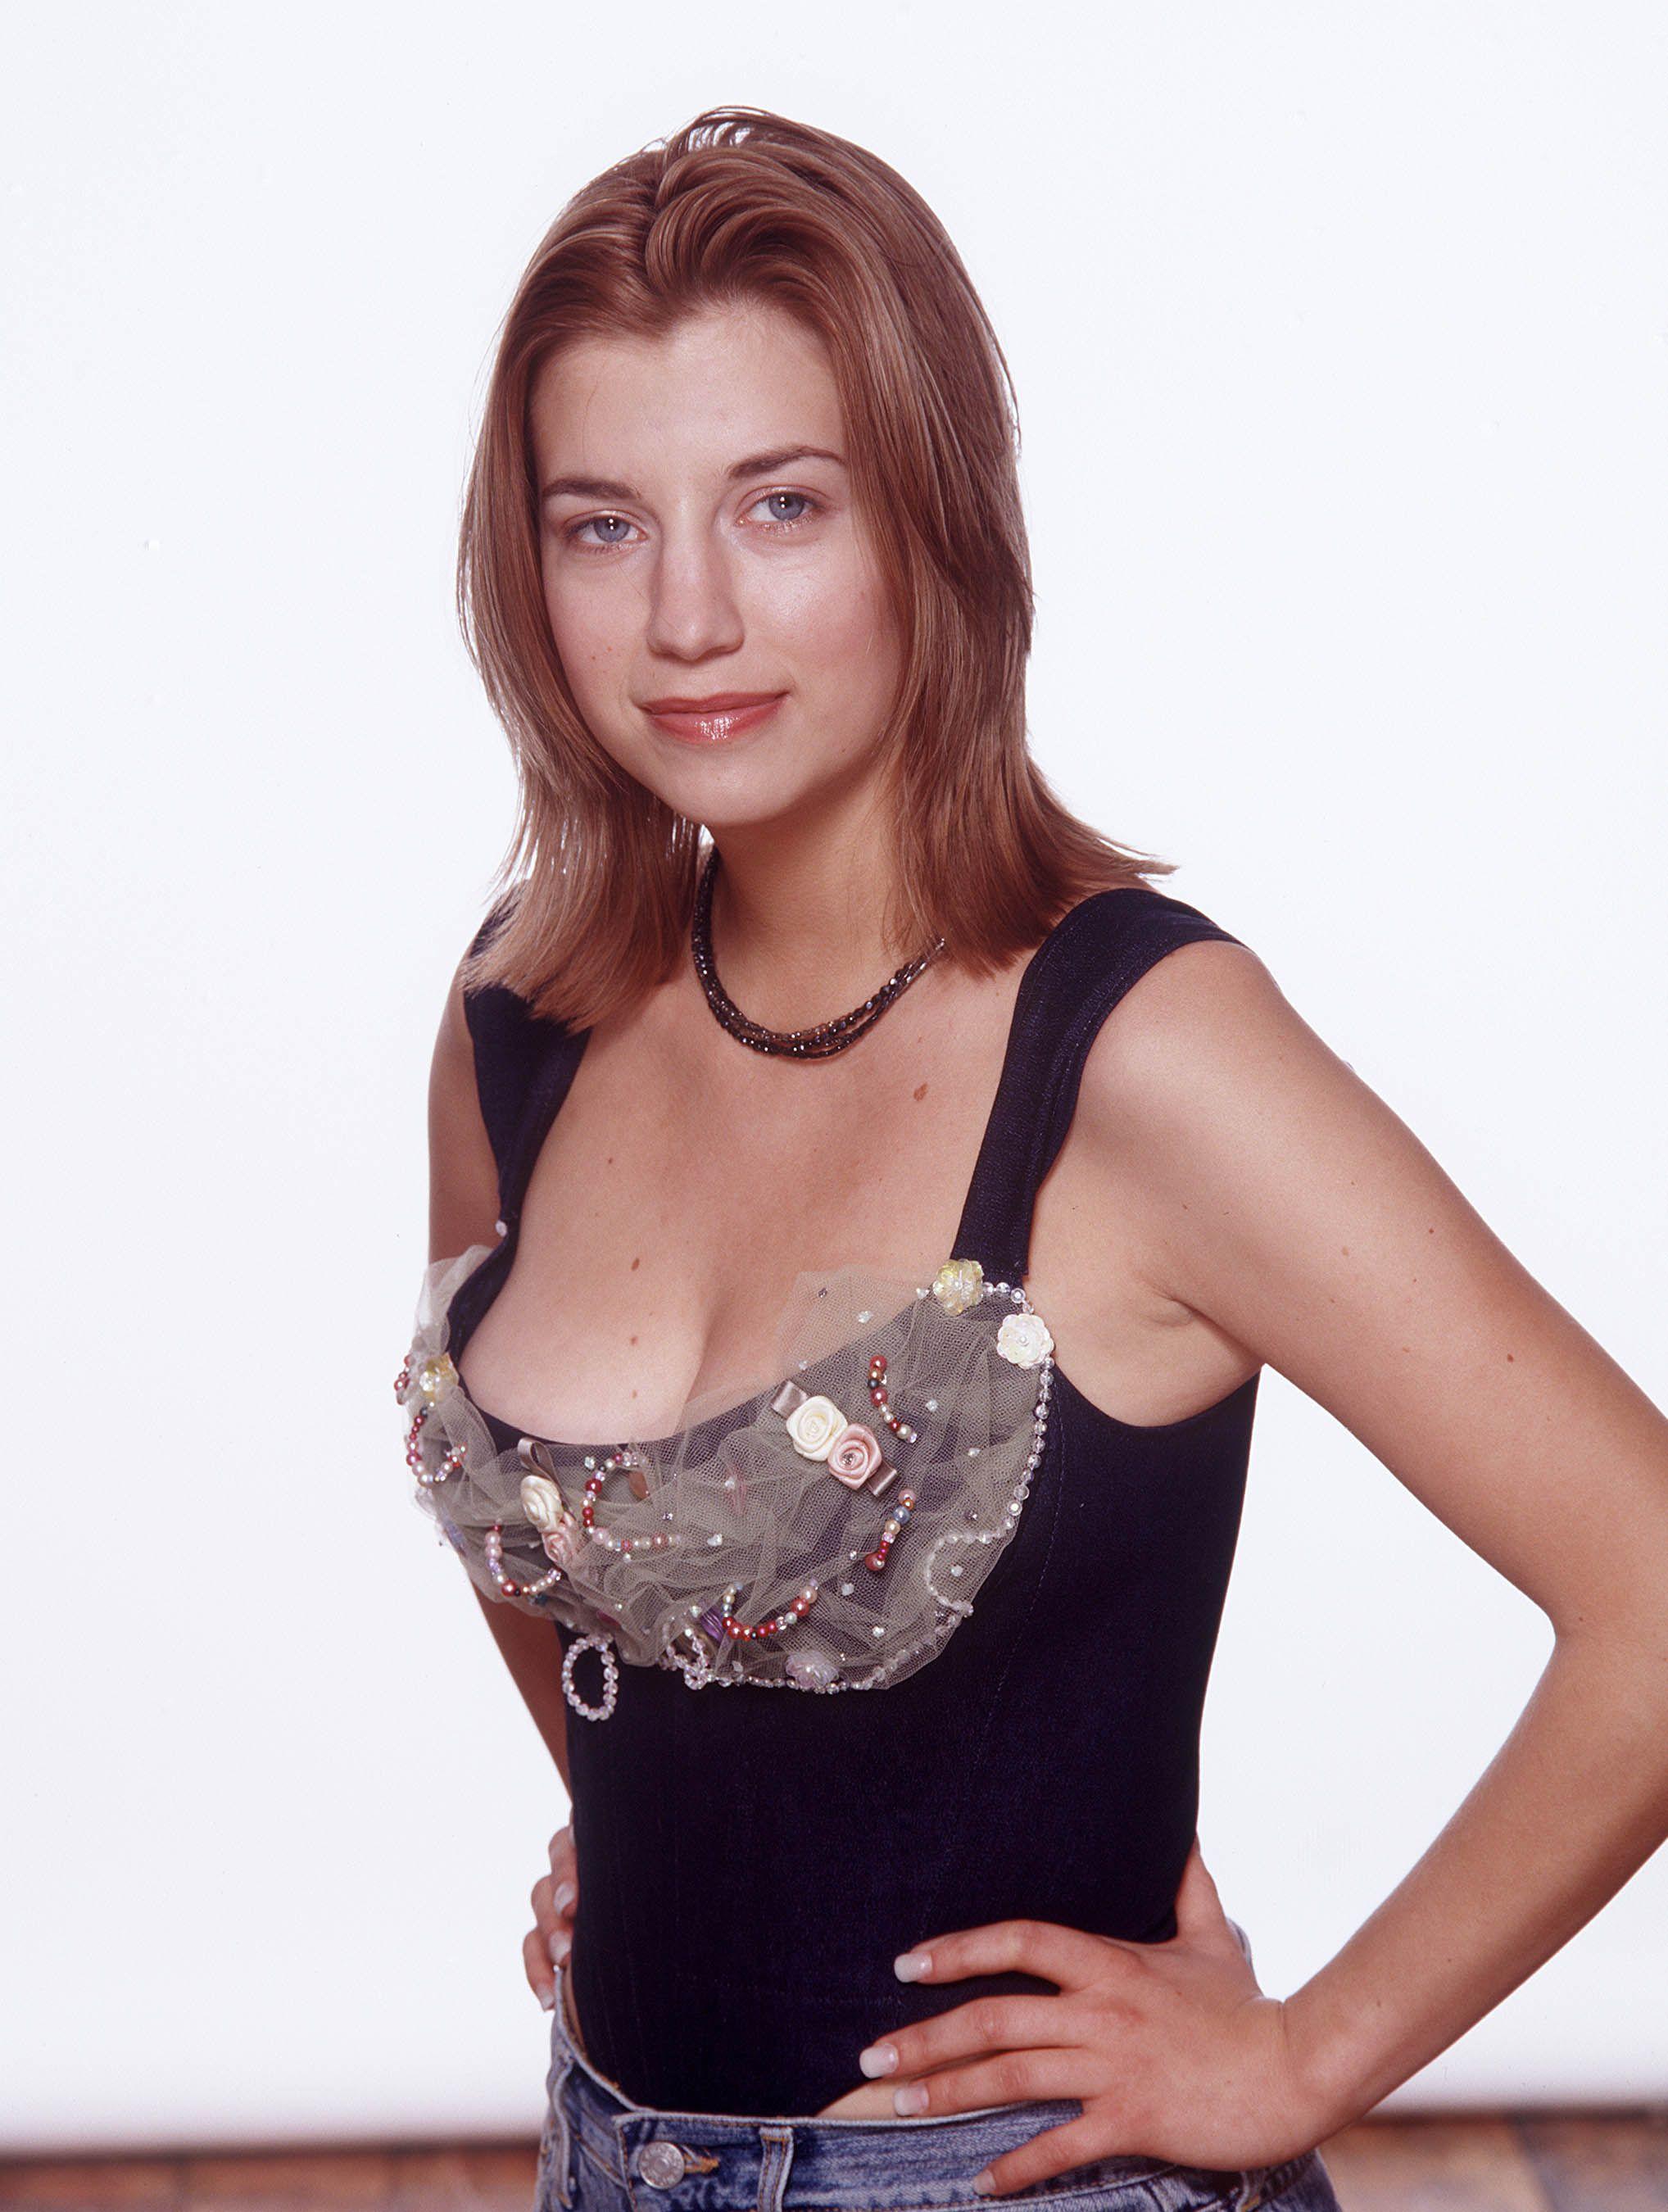 Coleen Garcia (b. 1992),Dolores Palumbo Hot movies Sahar Dolatshahi,Andrea Bowen